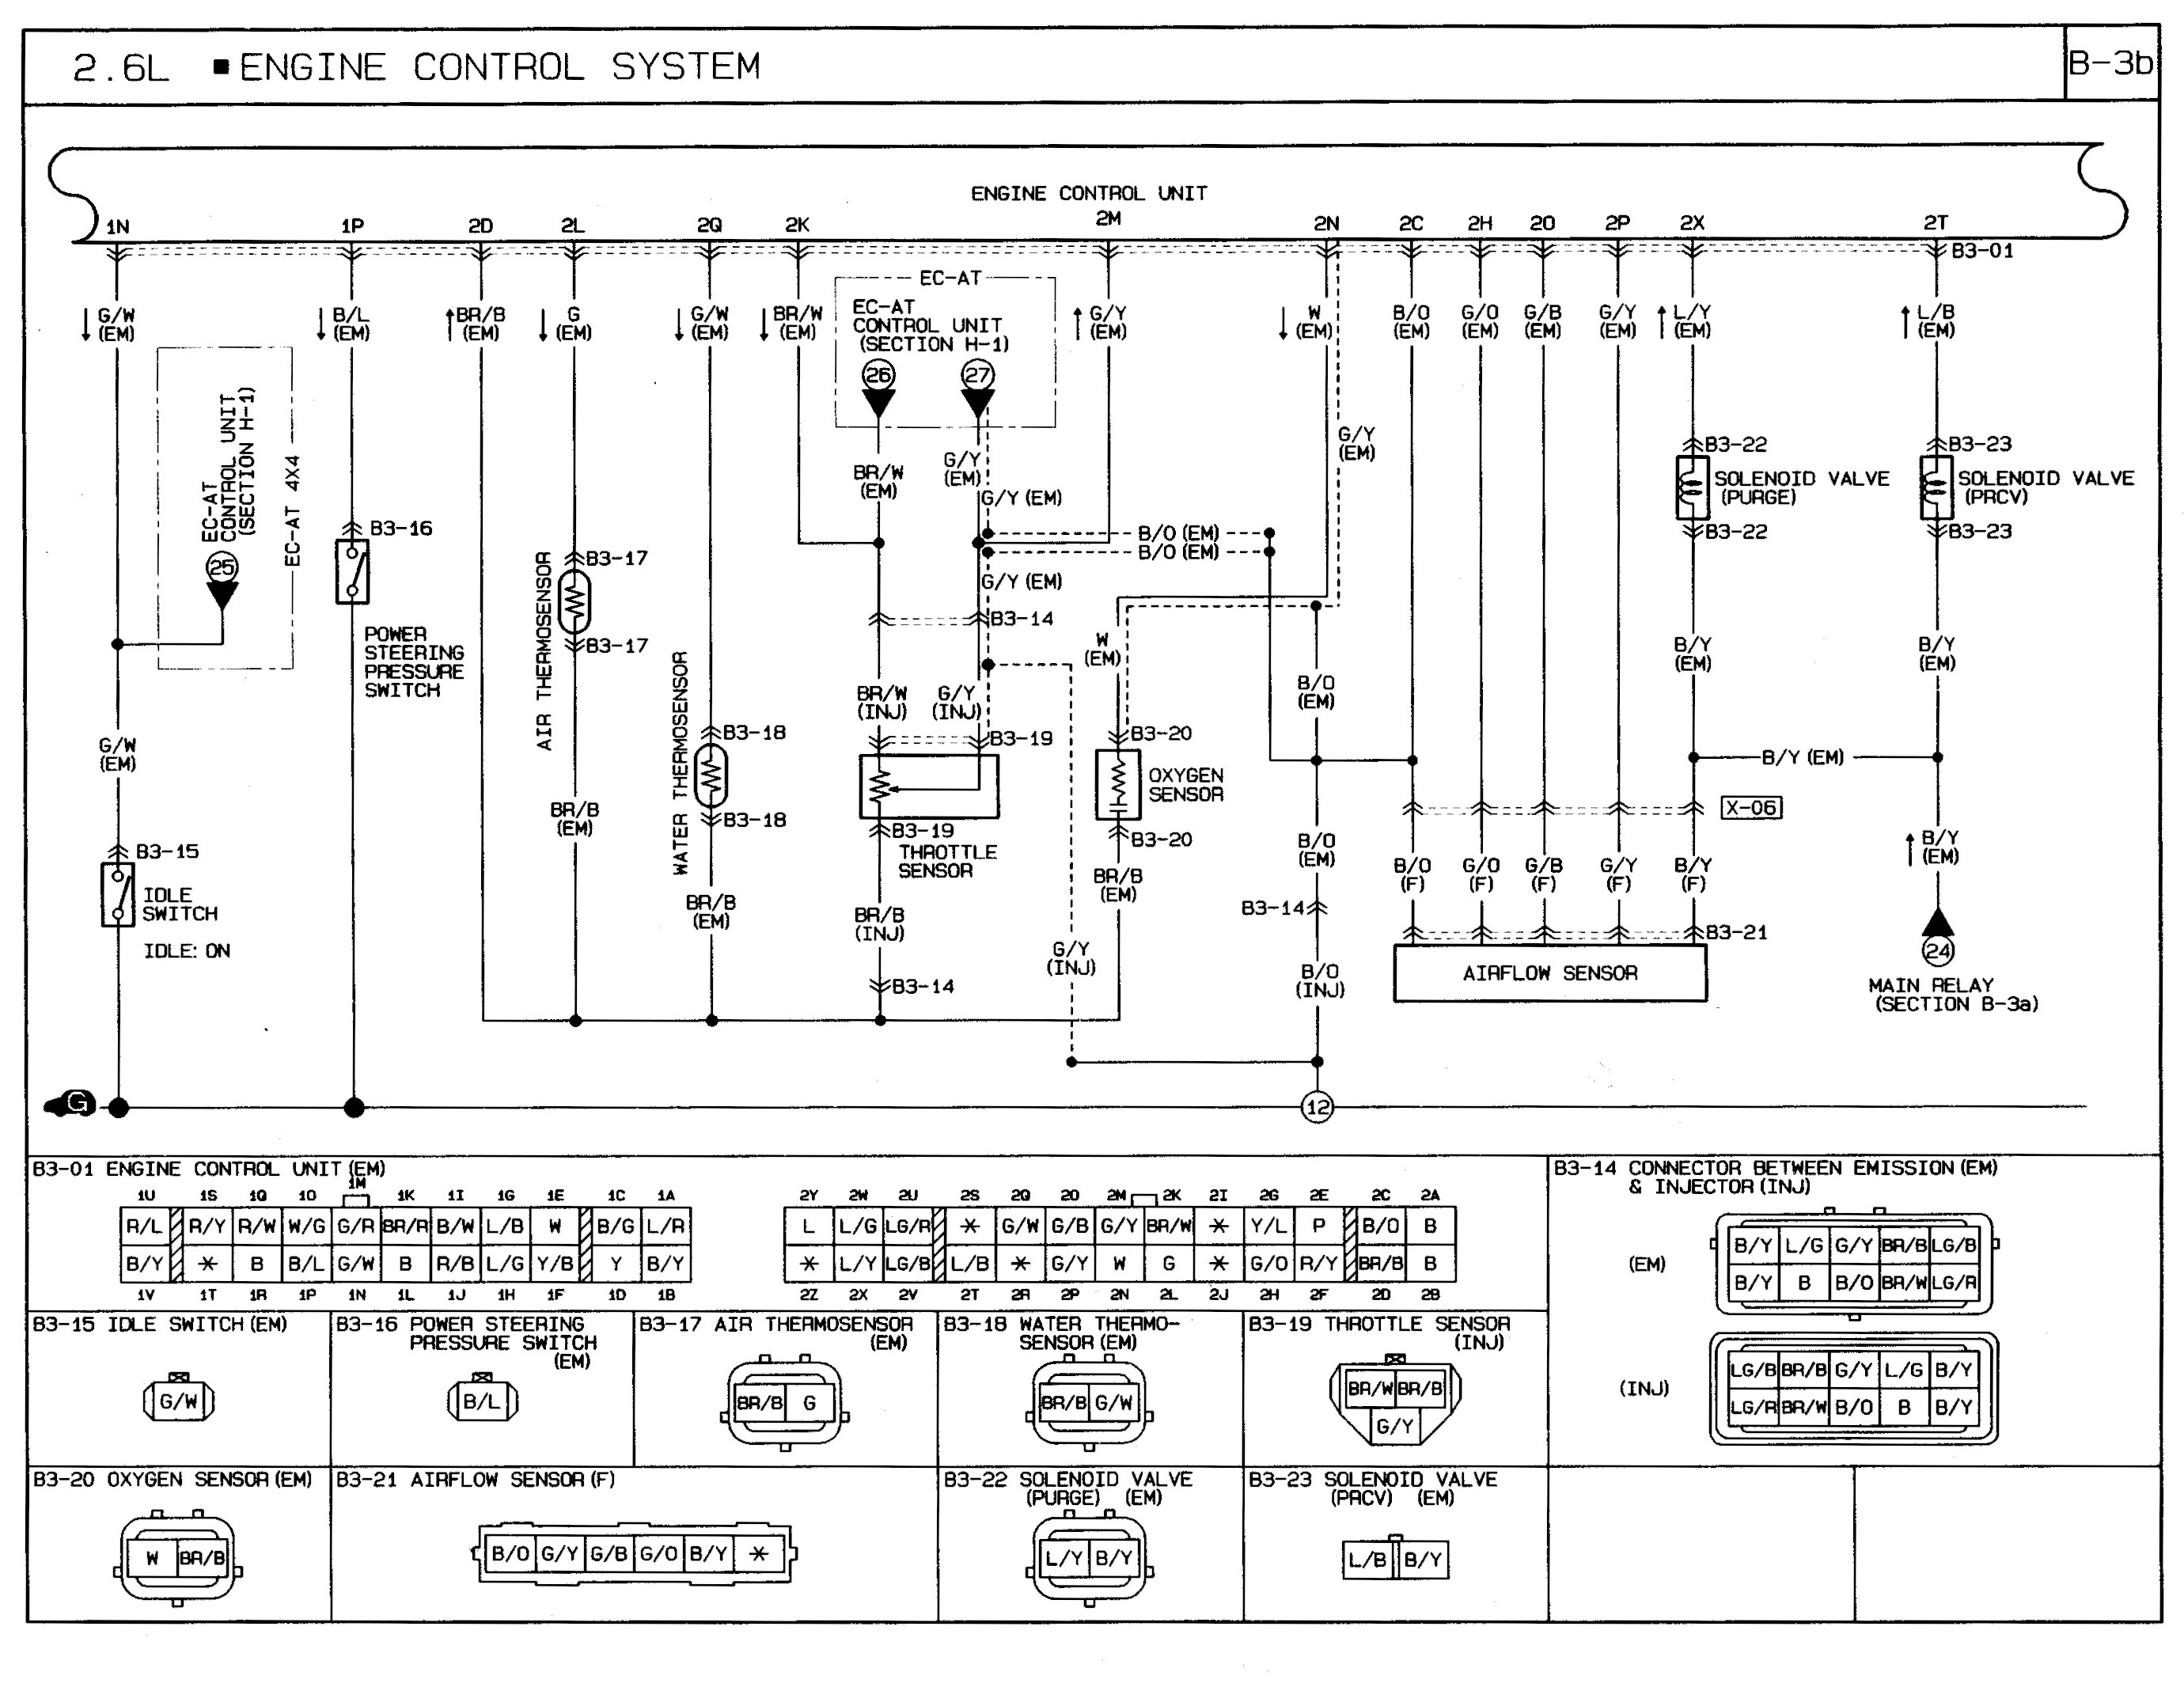 1997 mazda mx6 wiring schematic kc 7608  mazda wiring diagram schematic wiring  mazda wiring diagram schematic wiring